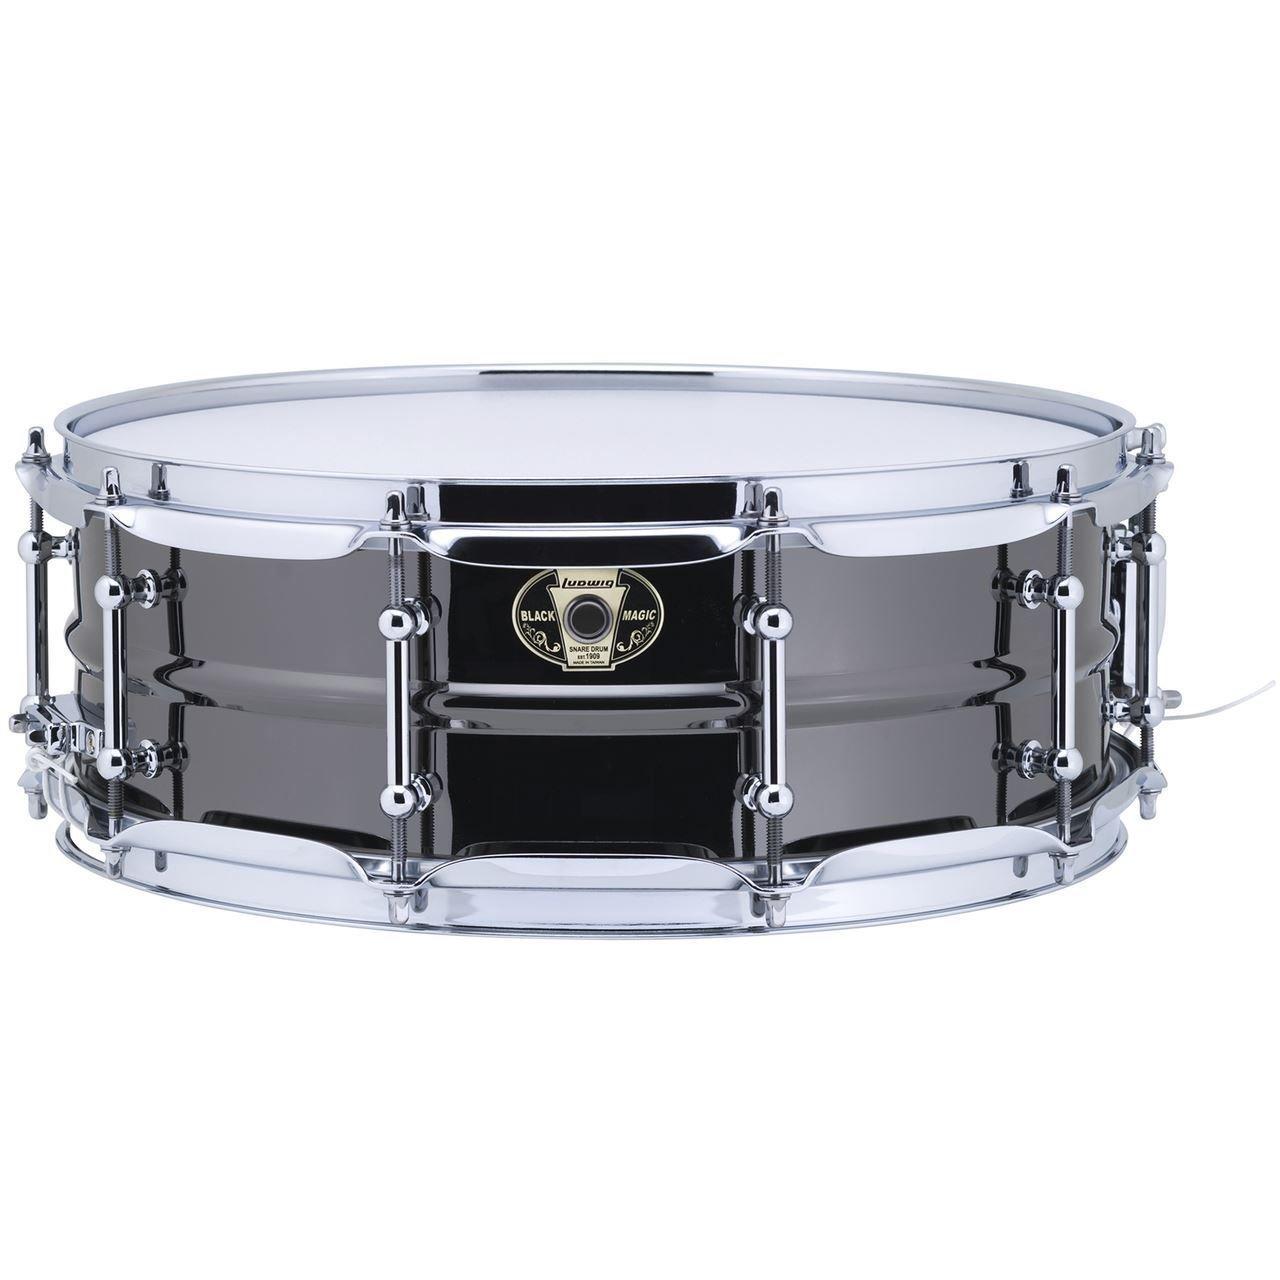 Ludwig 5.5 x 14 Black Magic Snare